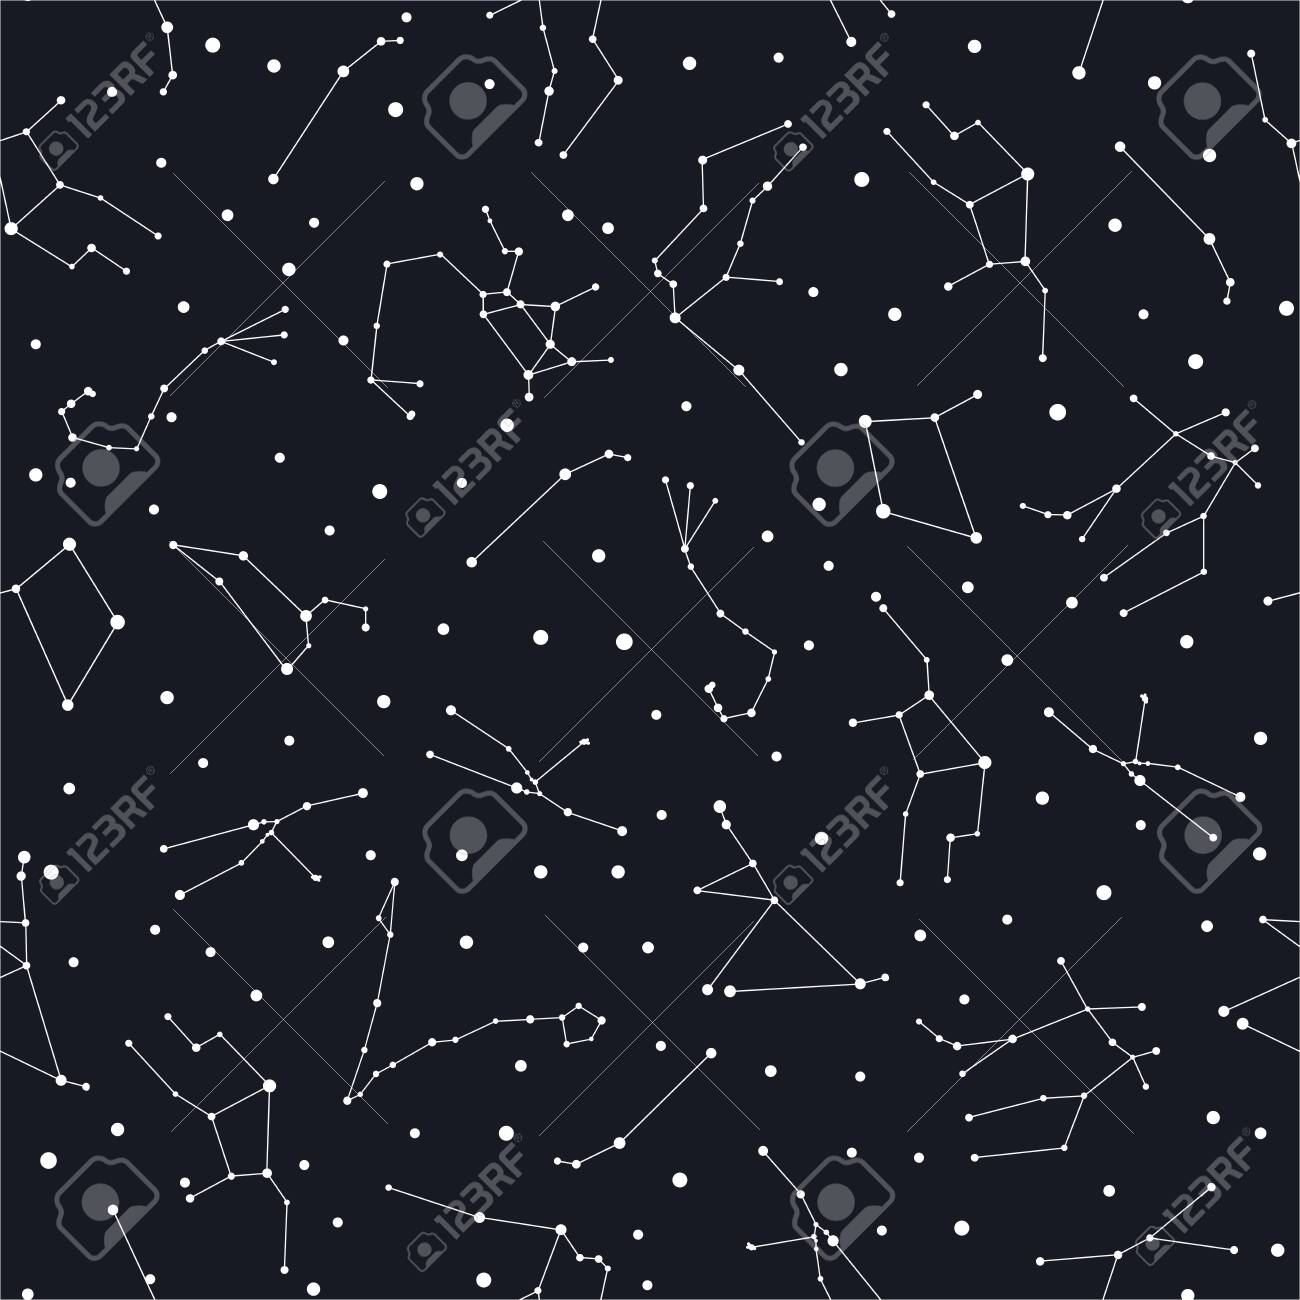 Zodiac Constellations Seamless Pattern White Stars On The Dark